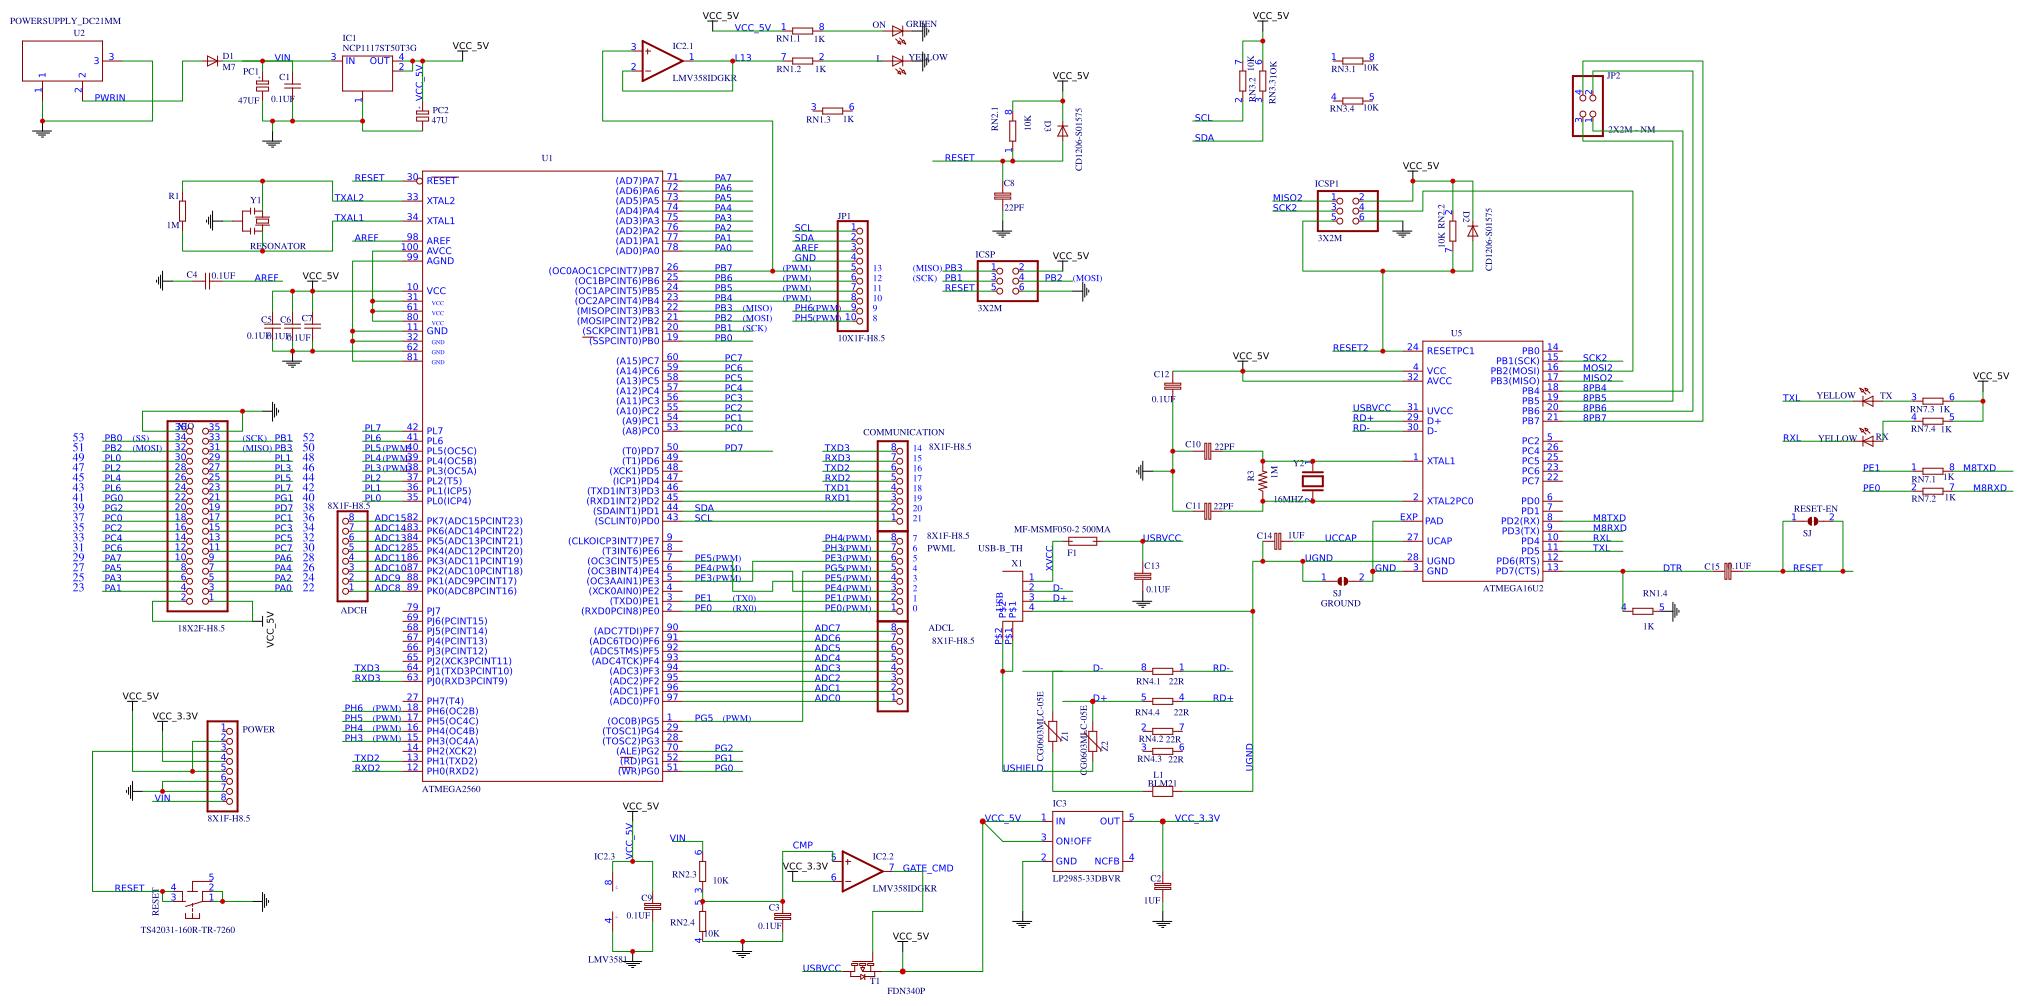 Arduino Mega 2560 schematic eqfq Resources - EasA on